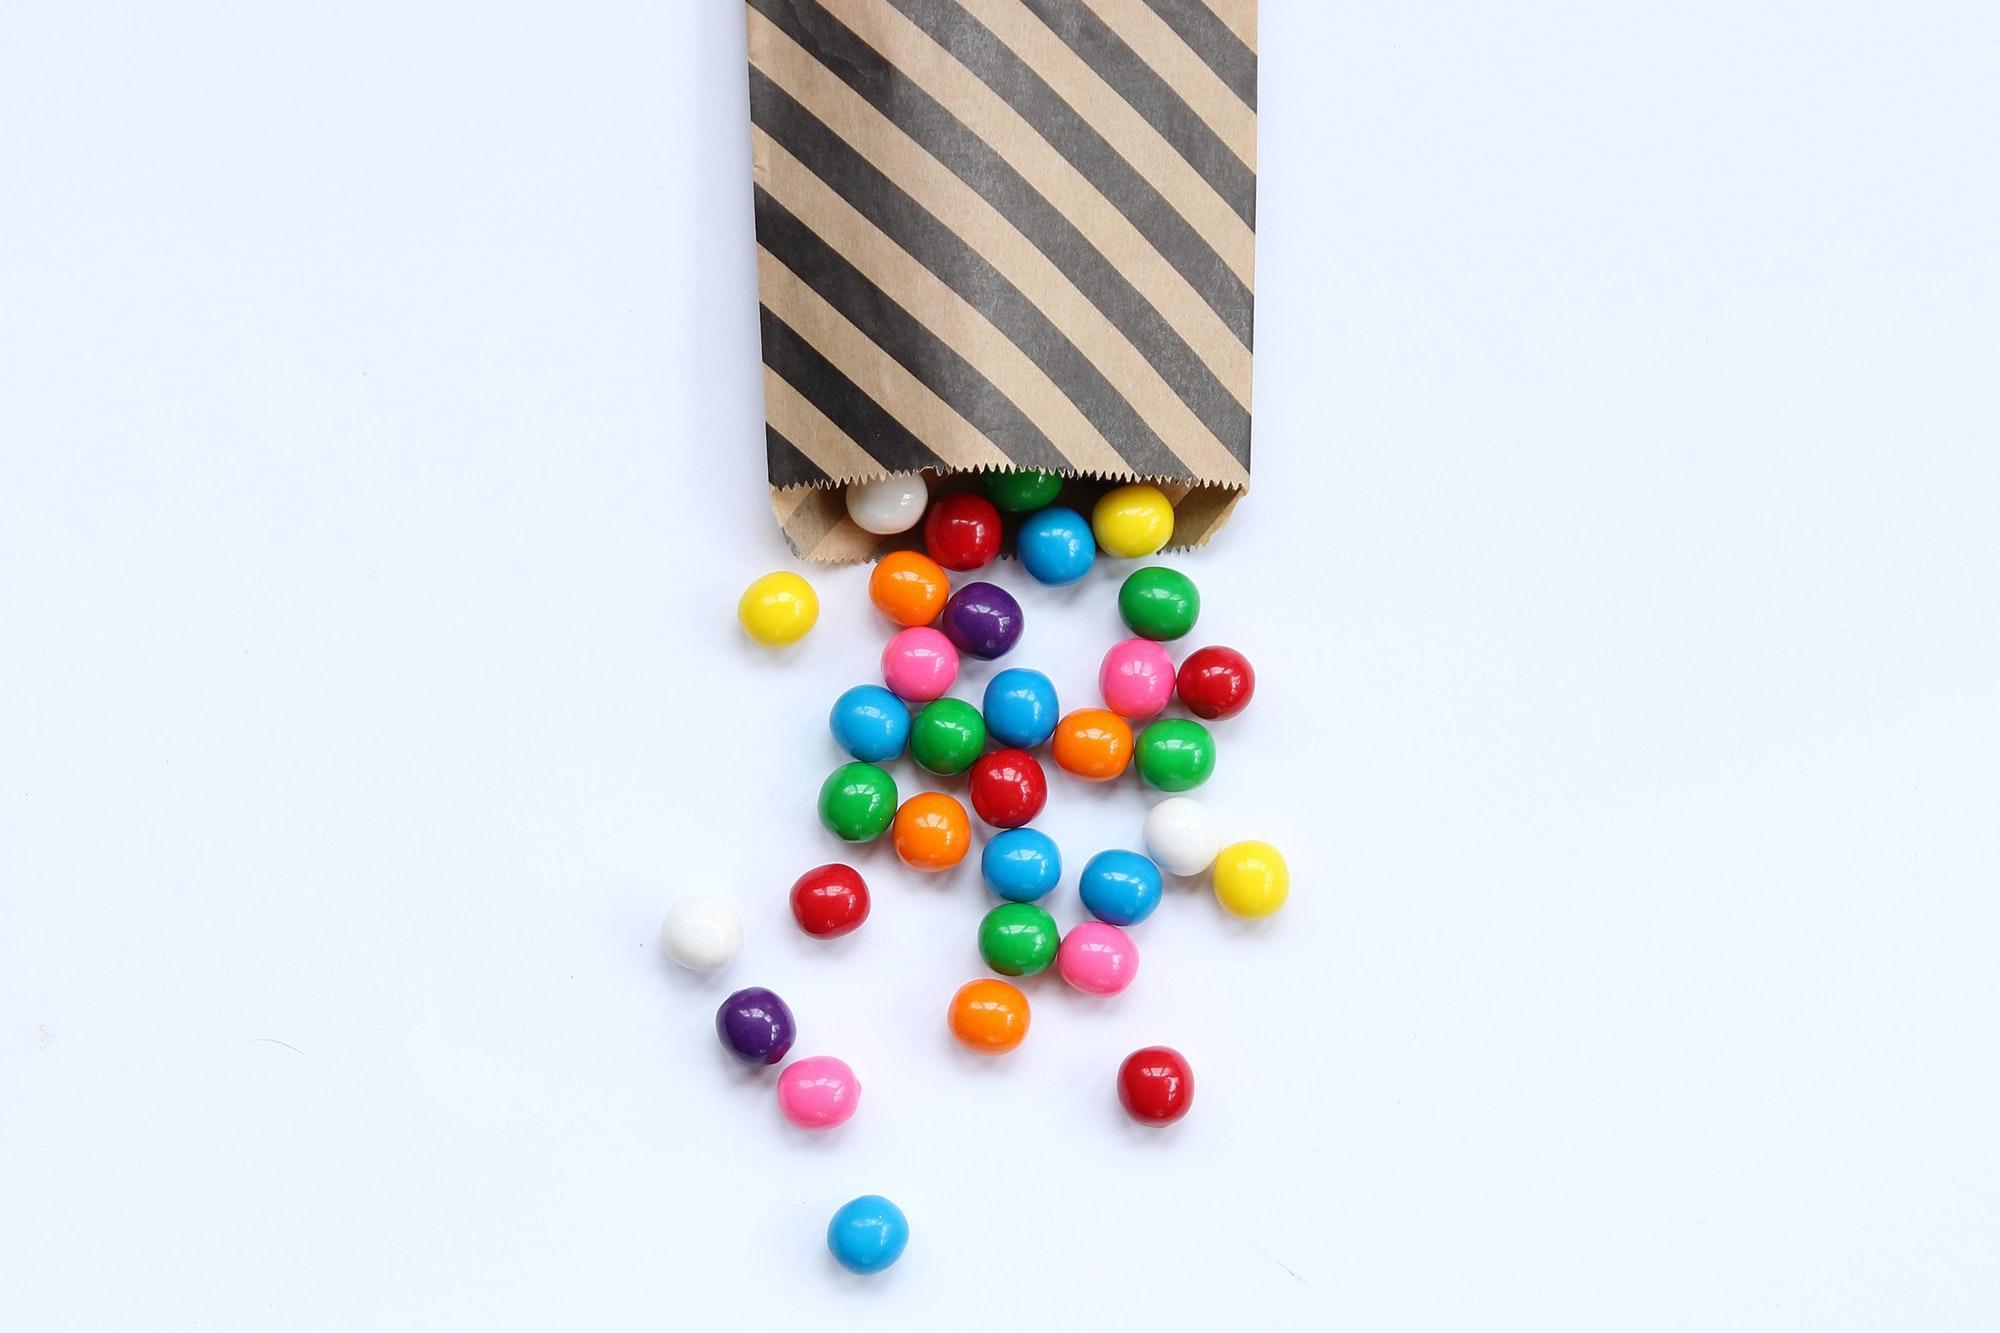 Bubblegum balls spilling out of party bag